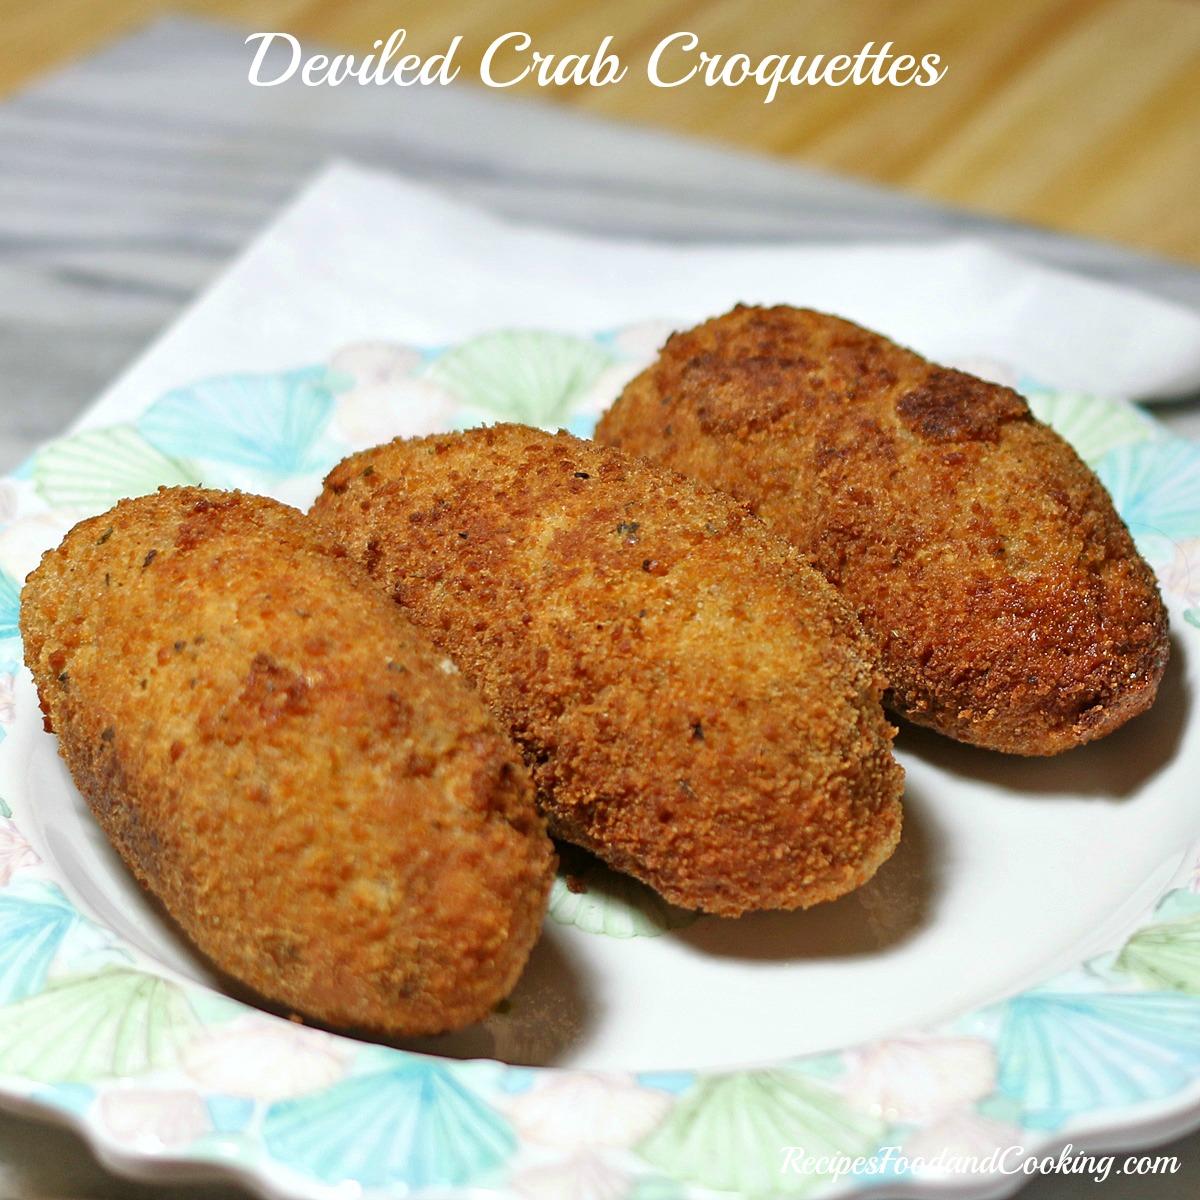 Deviled Crab Croquettes